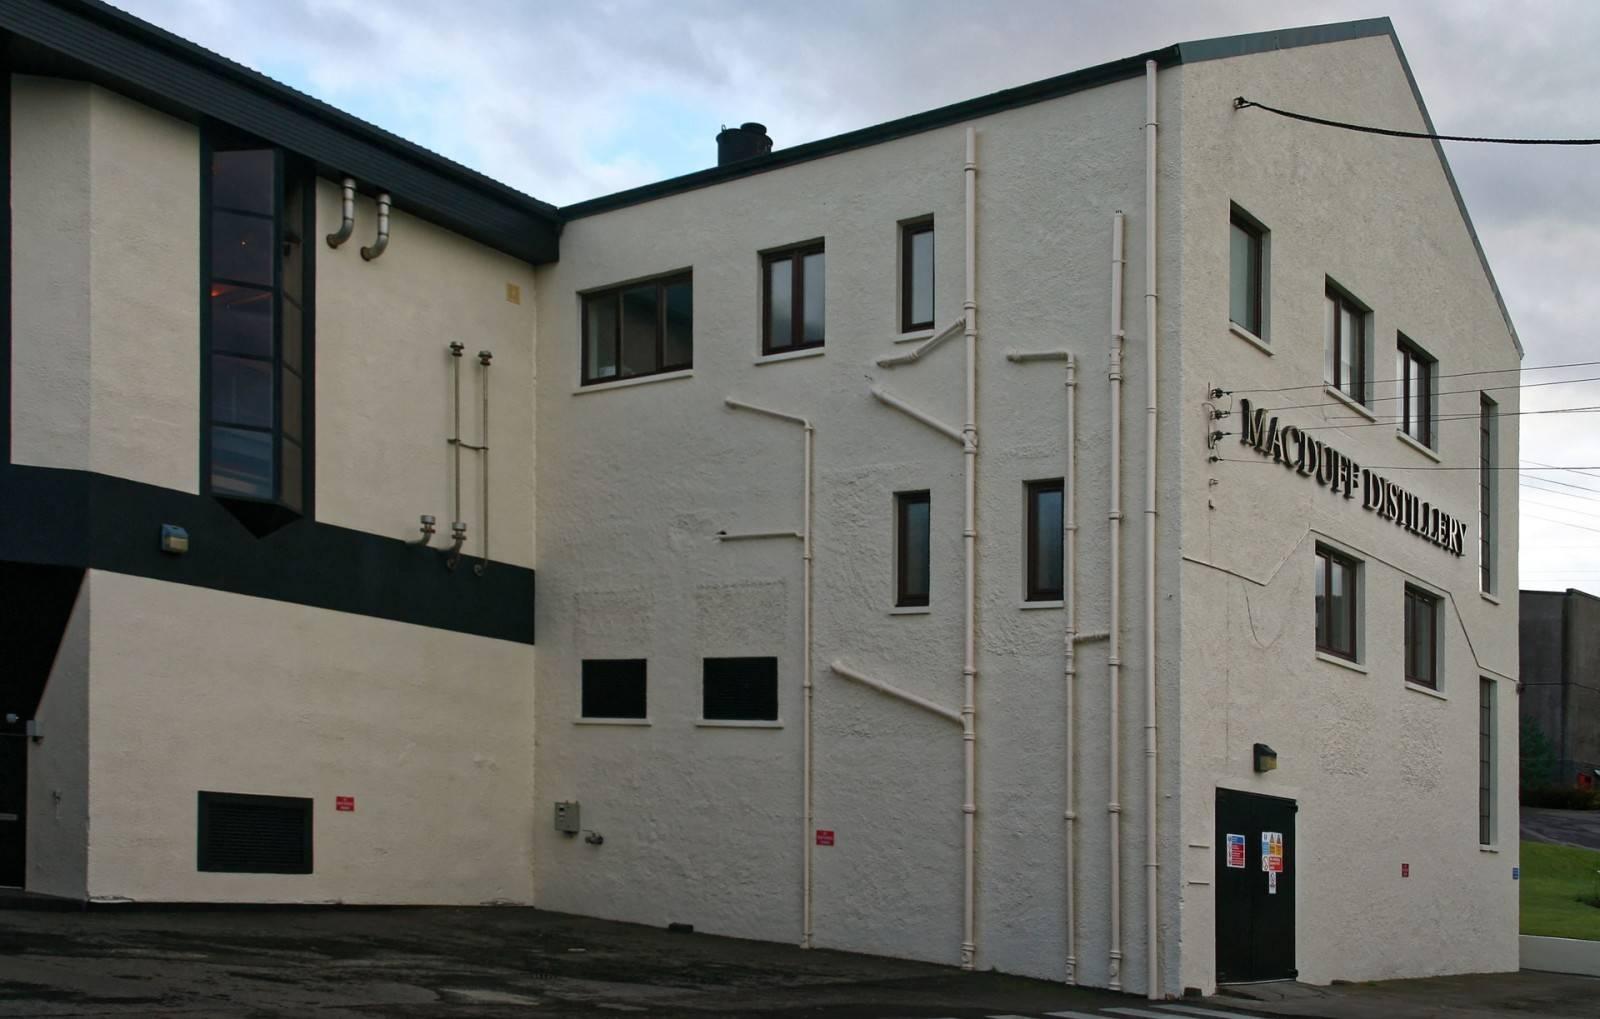 Macduff Stillhouse